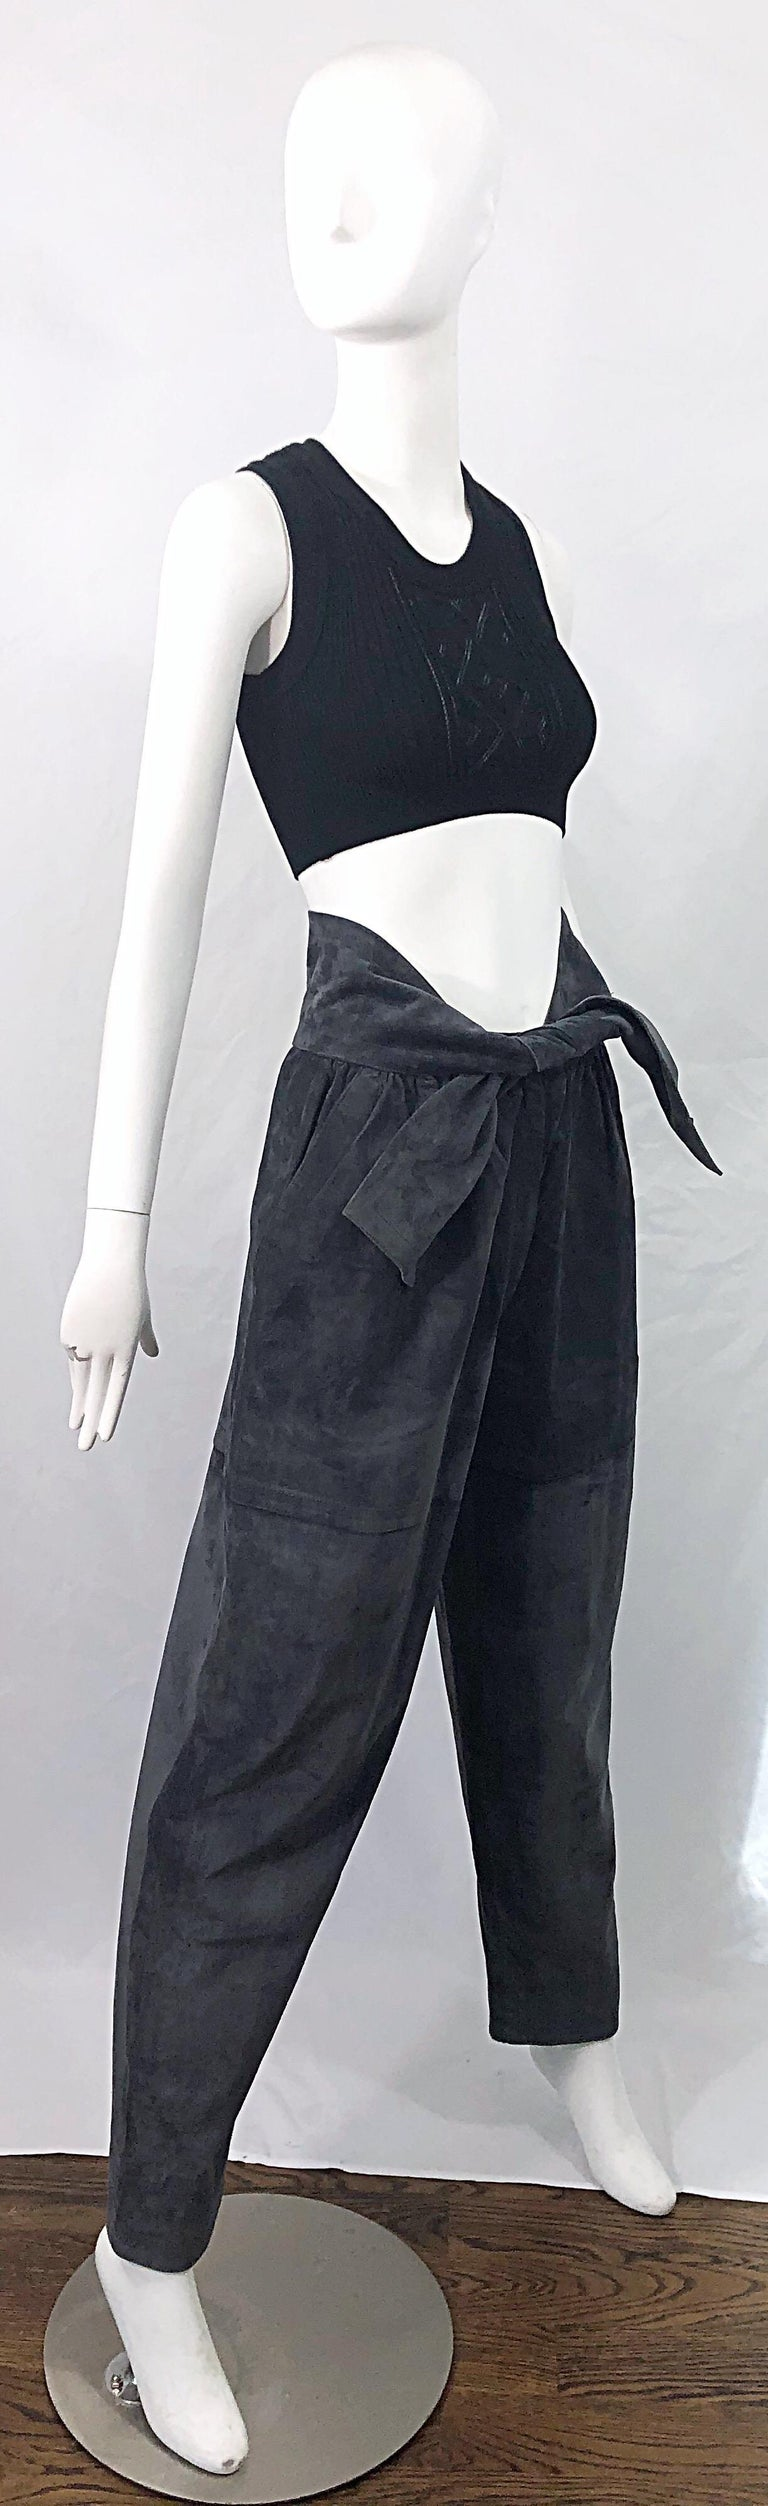 Vintage Yves Saint Laurent YSL 1980s Grey Suede Leather High Waisted Harem Pants For Sale 6